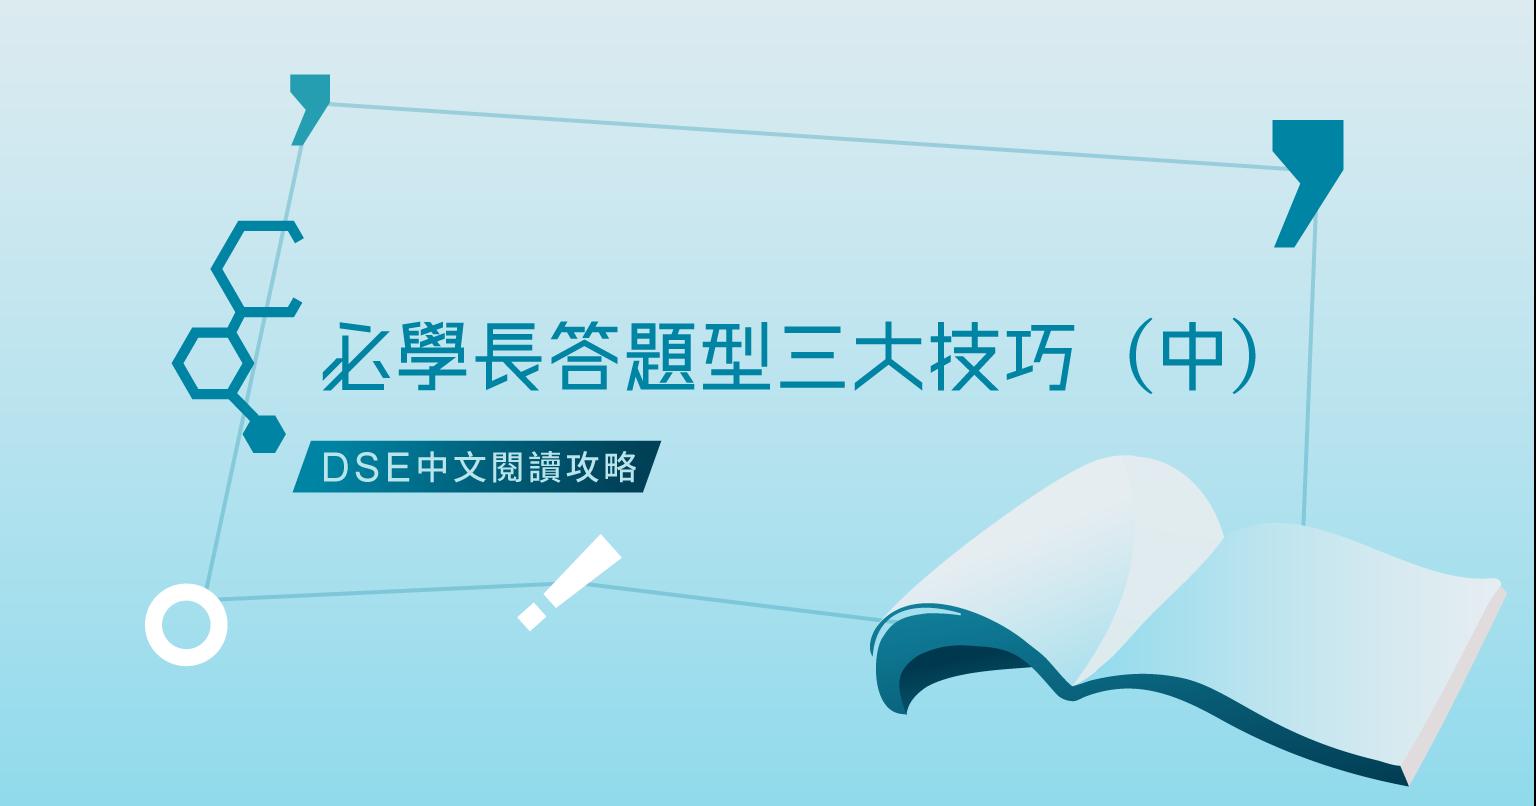 DSE中文卷一|必學三個閱讀理解長答題型技巧,範文解說助溫習!(中)